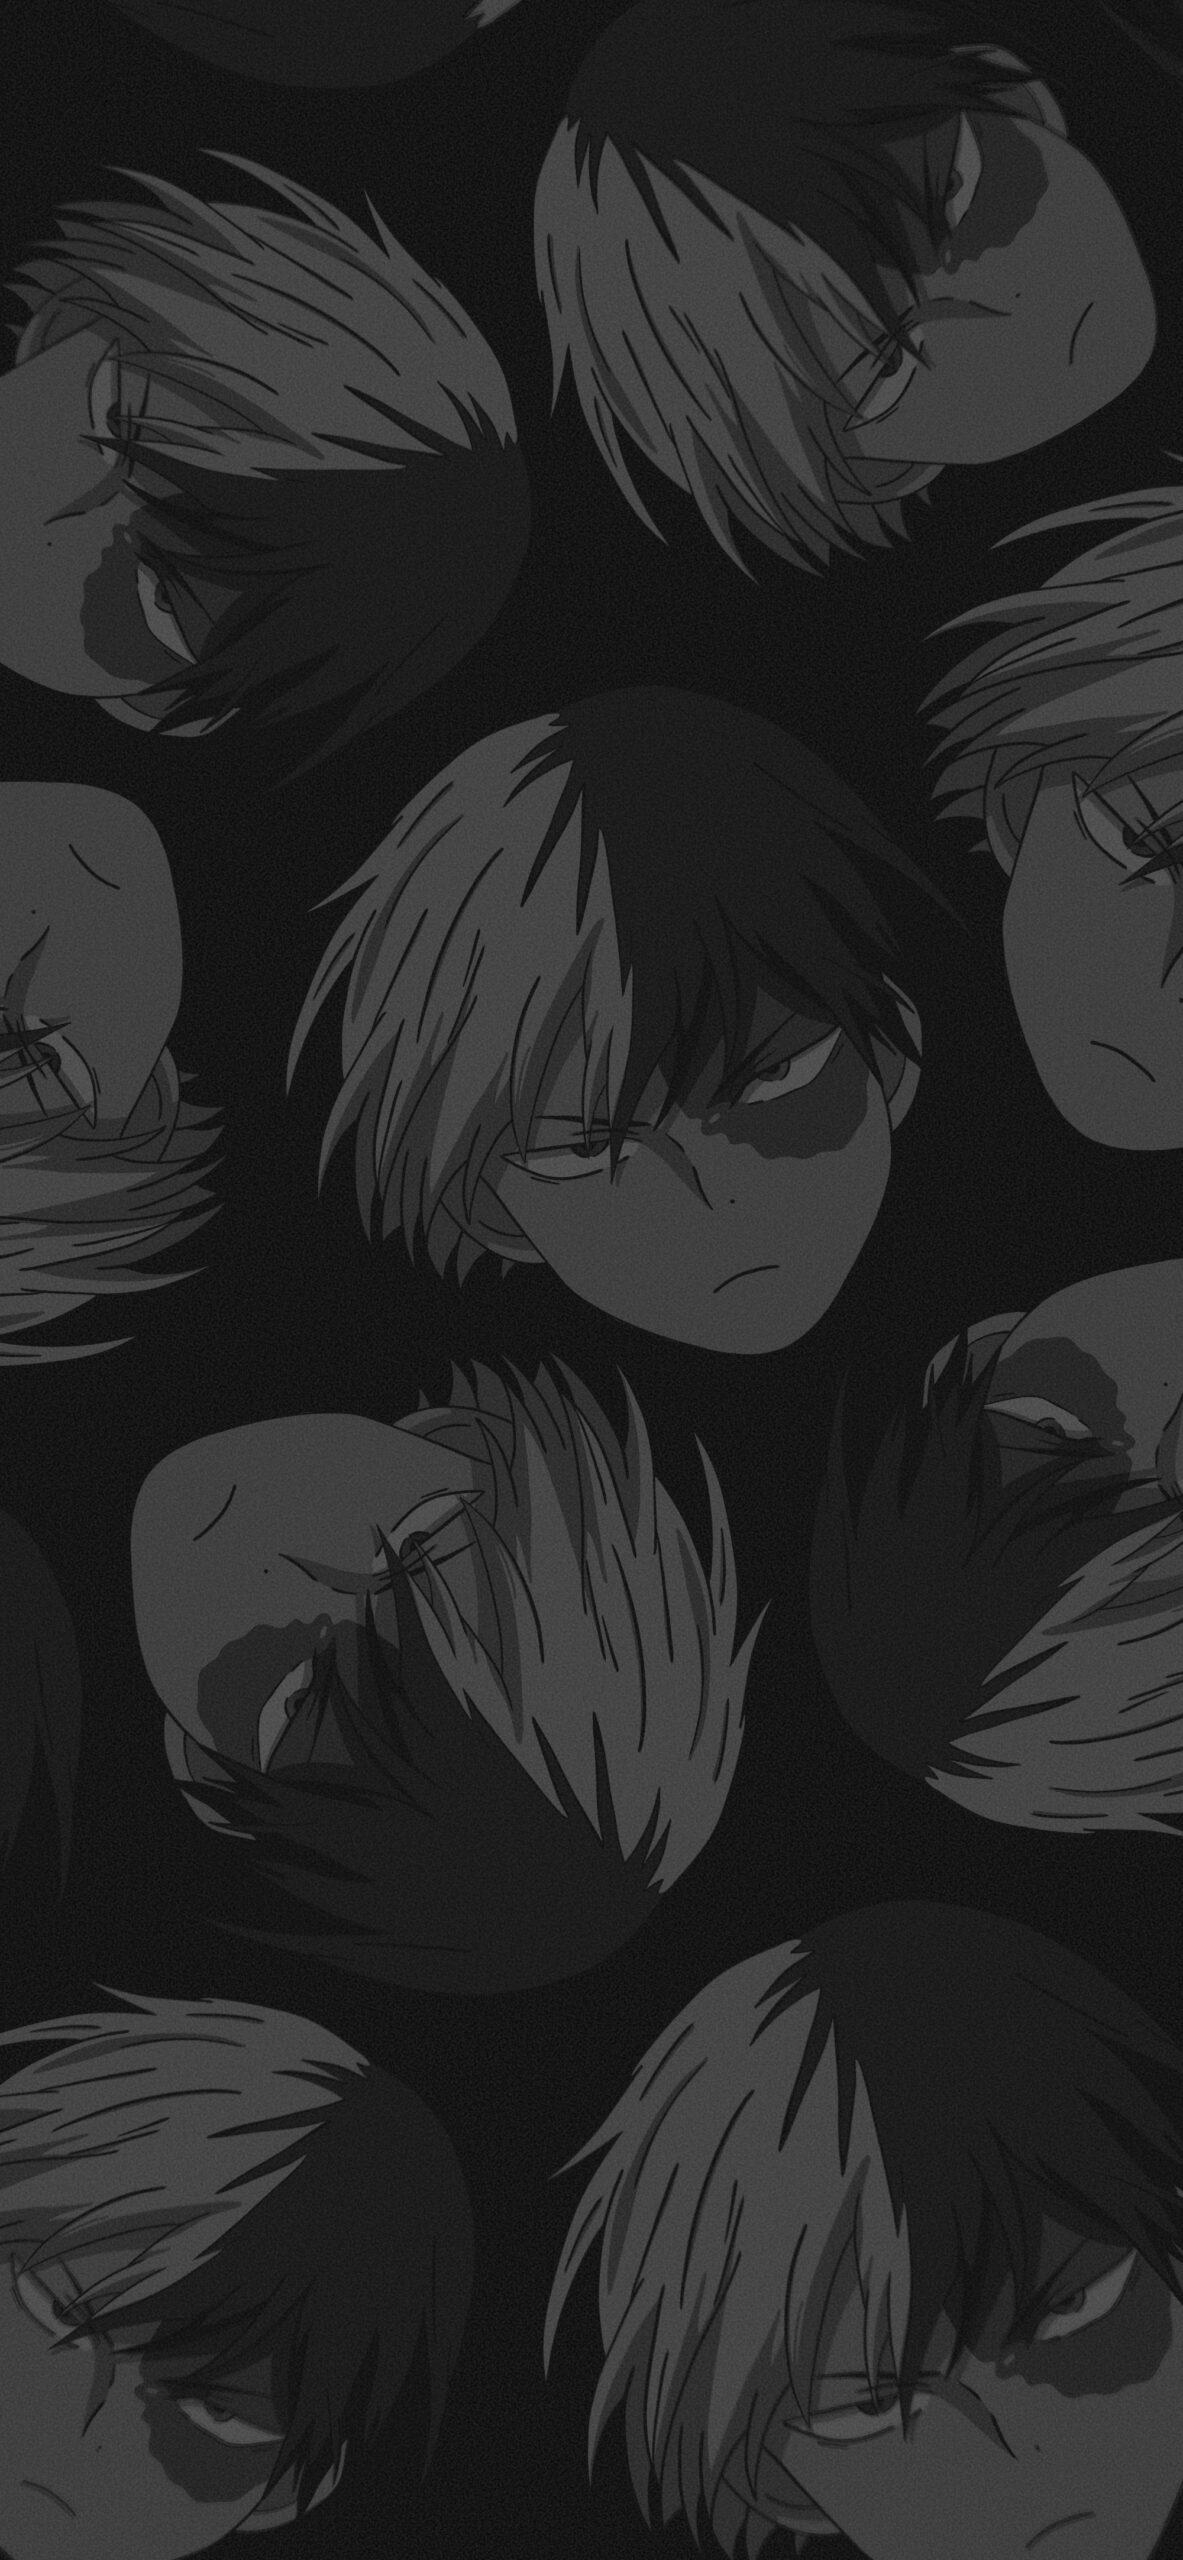 mha shoto todoroki black background